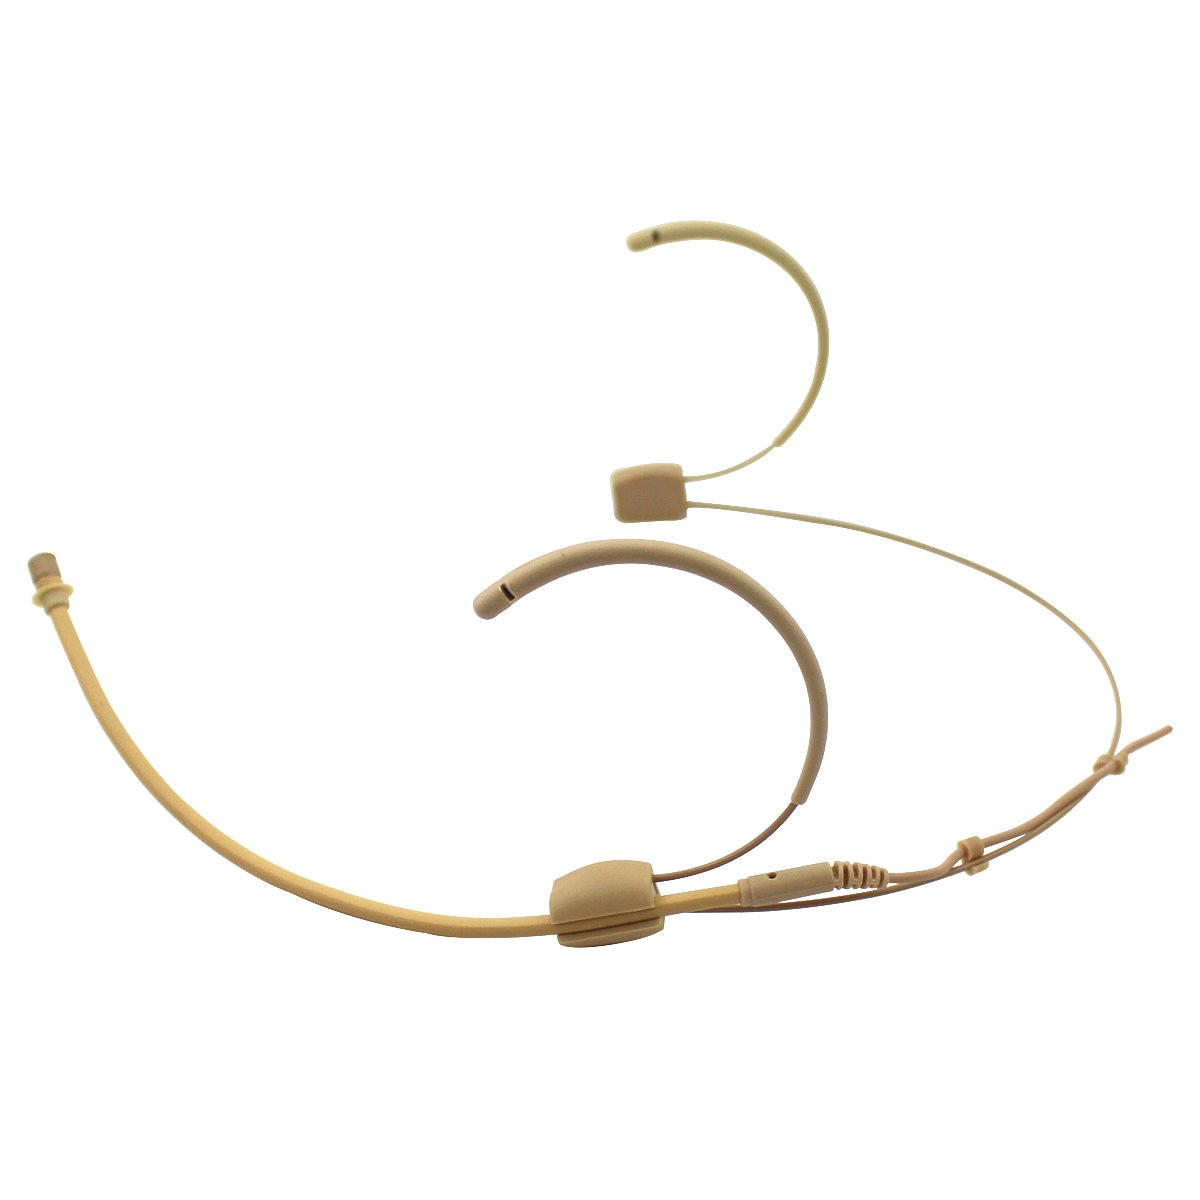 Pro Earhook Headset Headworn Omnidirectional Microphone JK MIC-J 060 Compatible with Shure Wireless Transmitter Mini XLR TA4F Plug